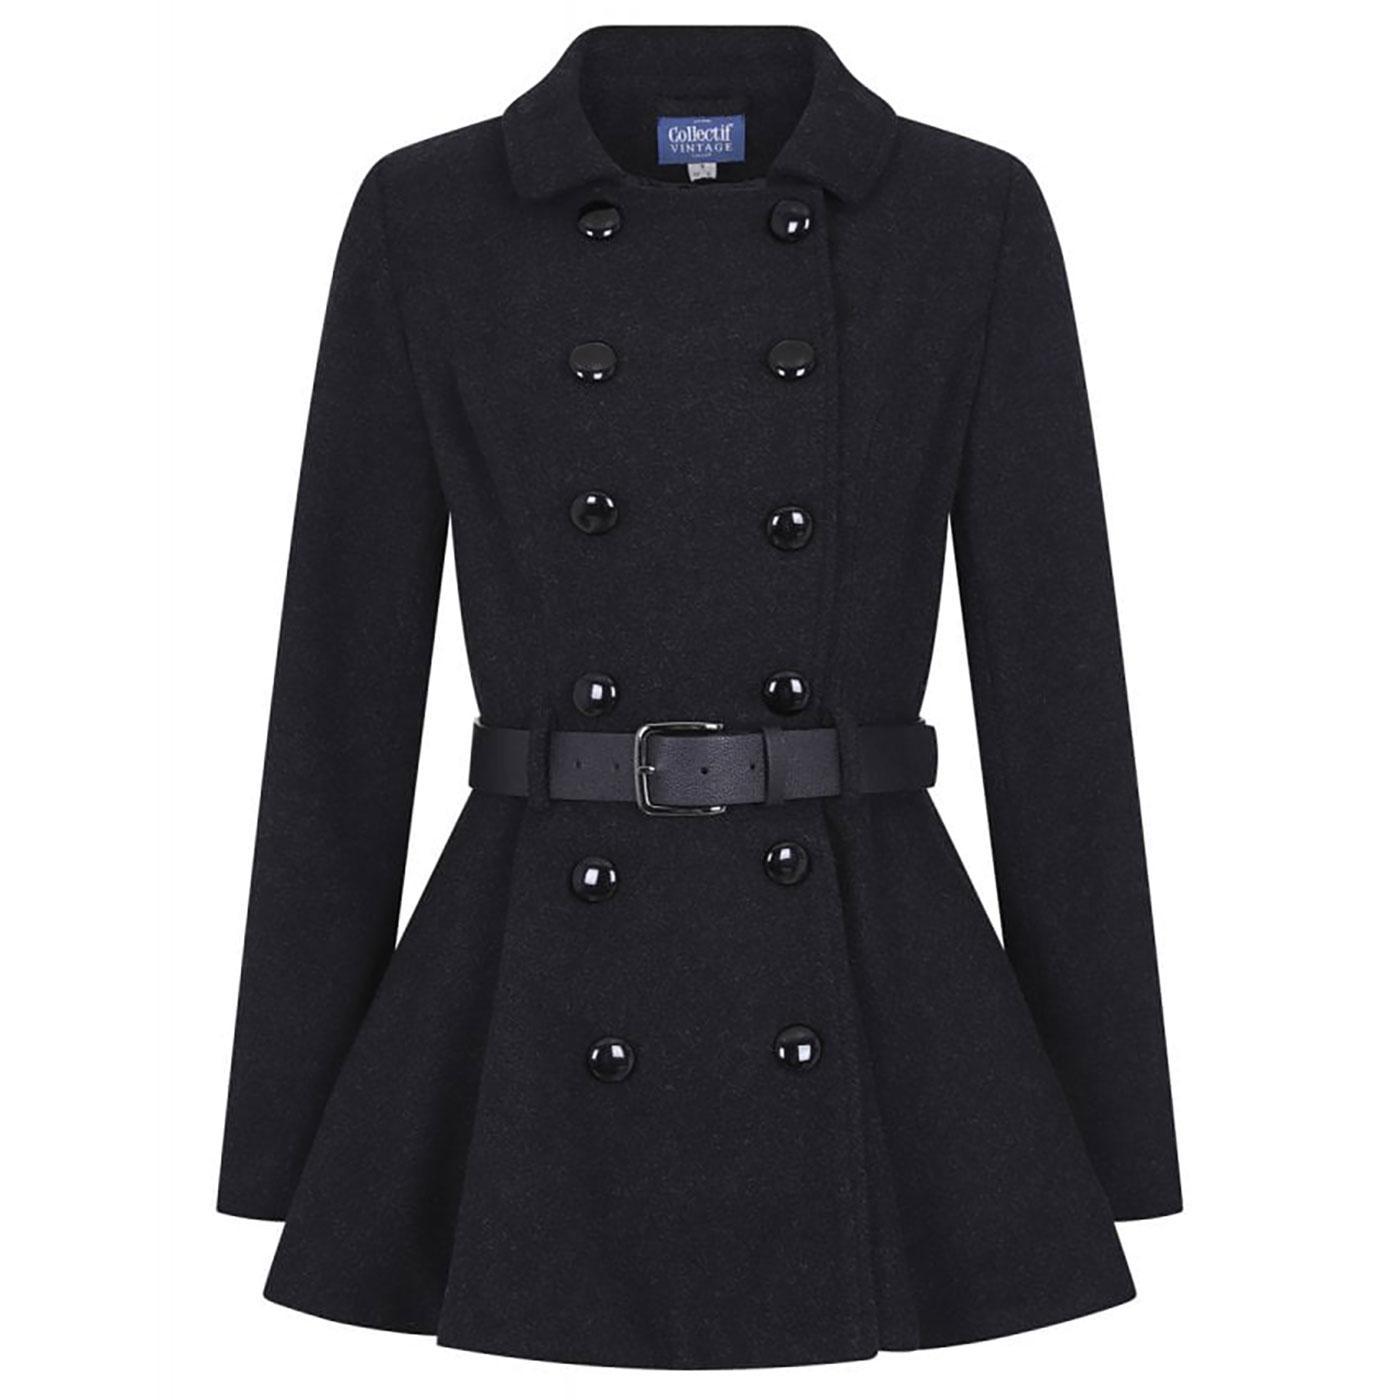 Darienne COLLECTIF Plain Vintage Peplum Jacket